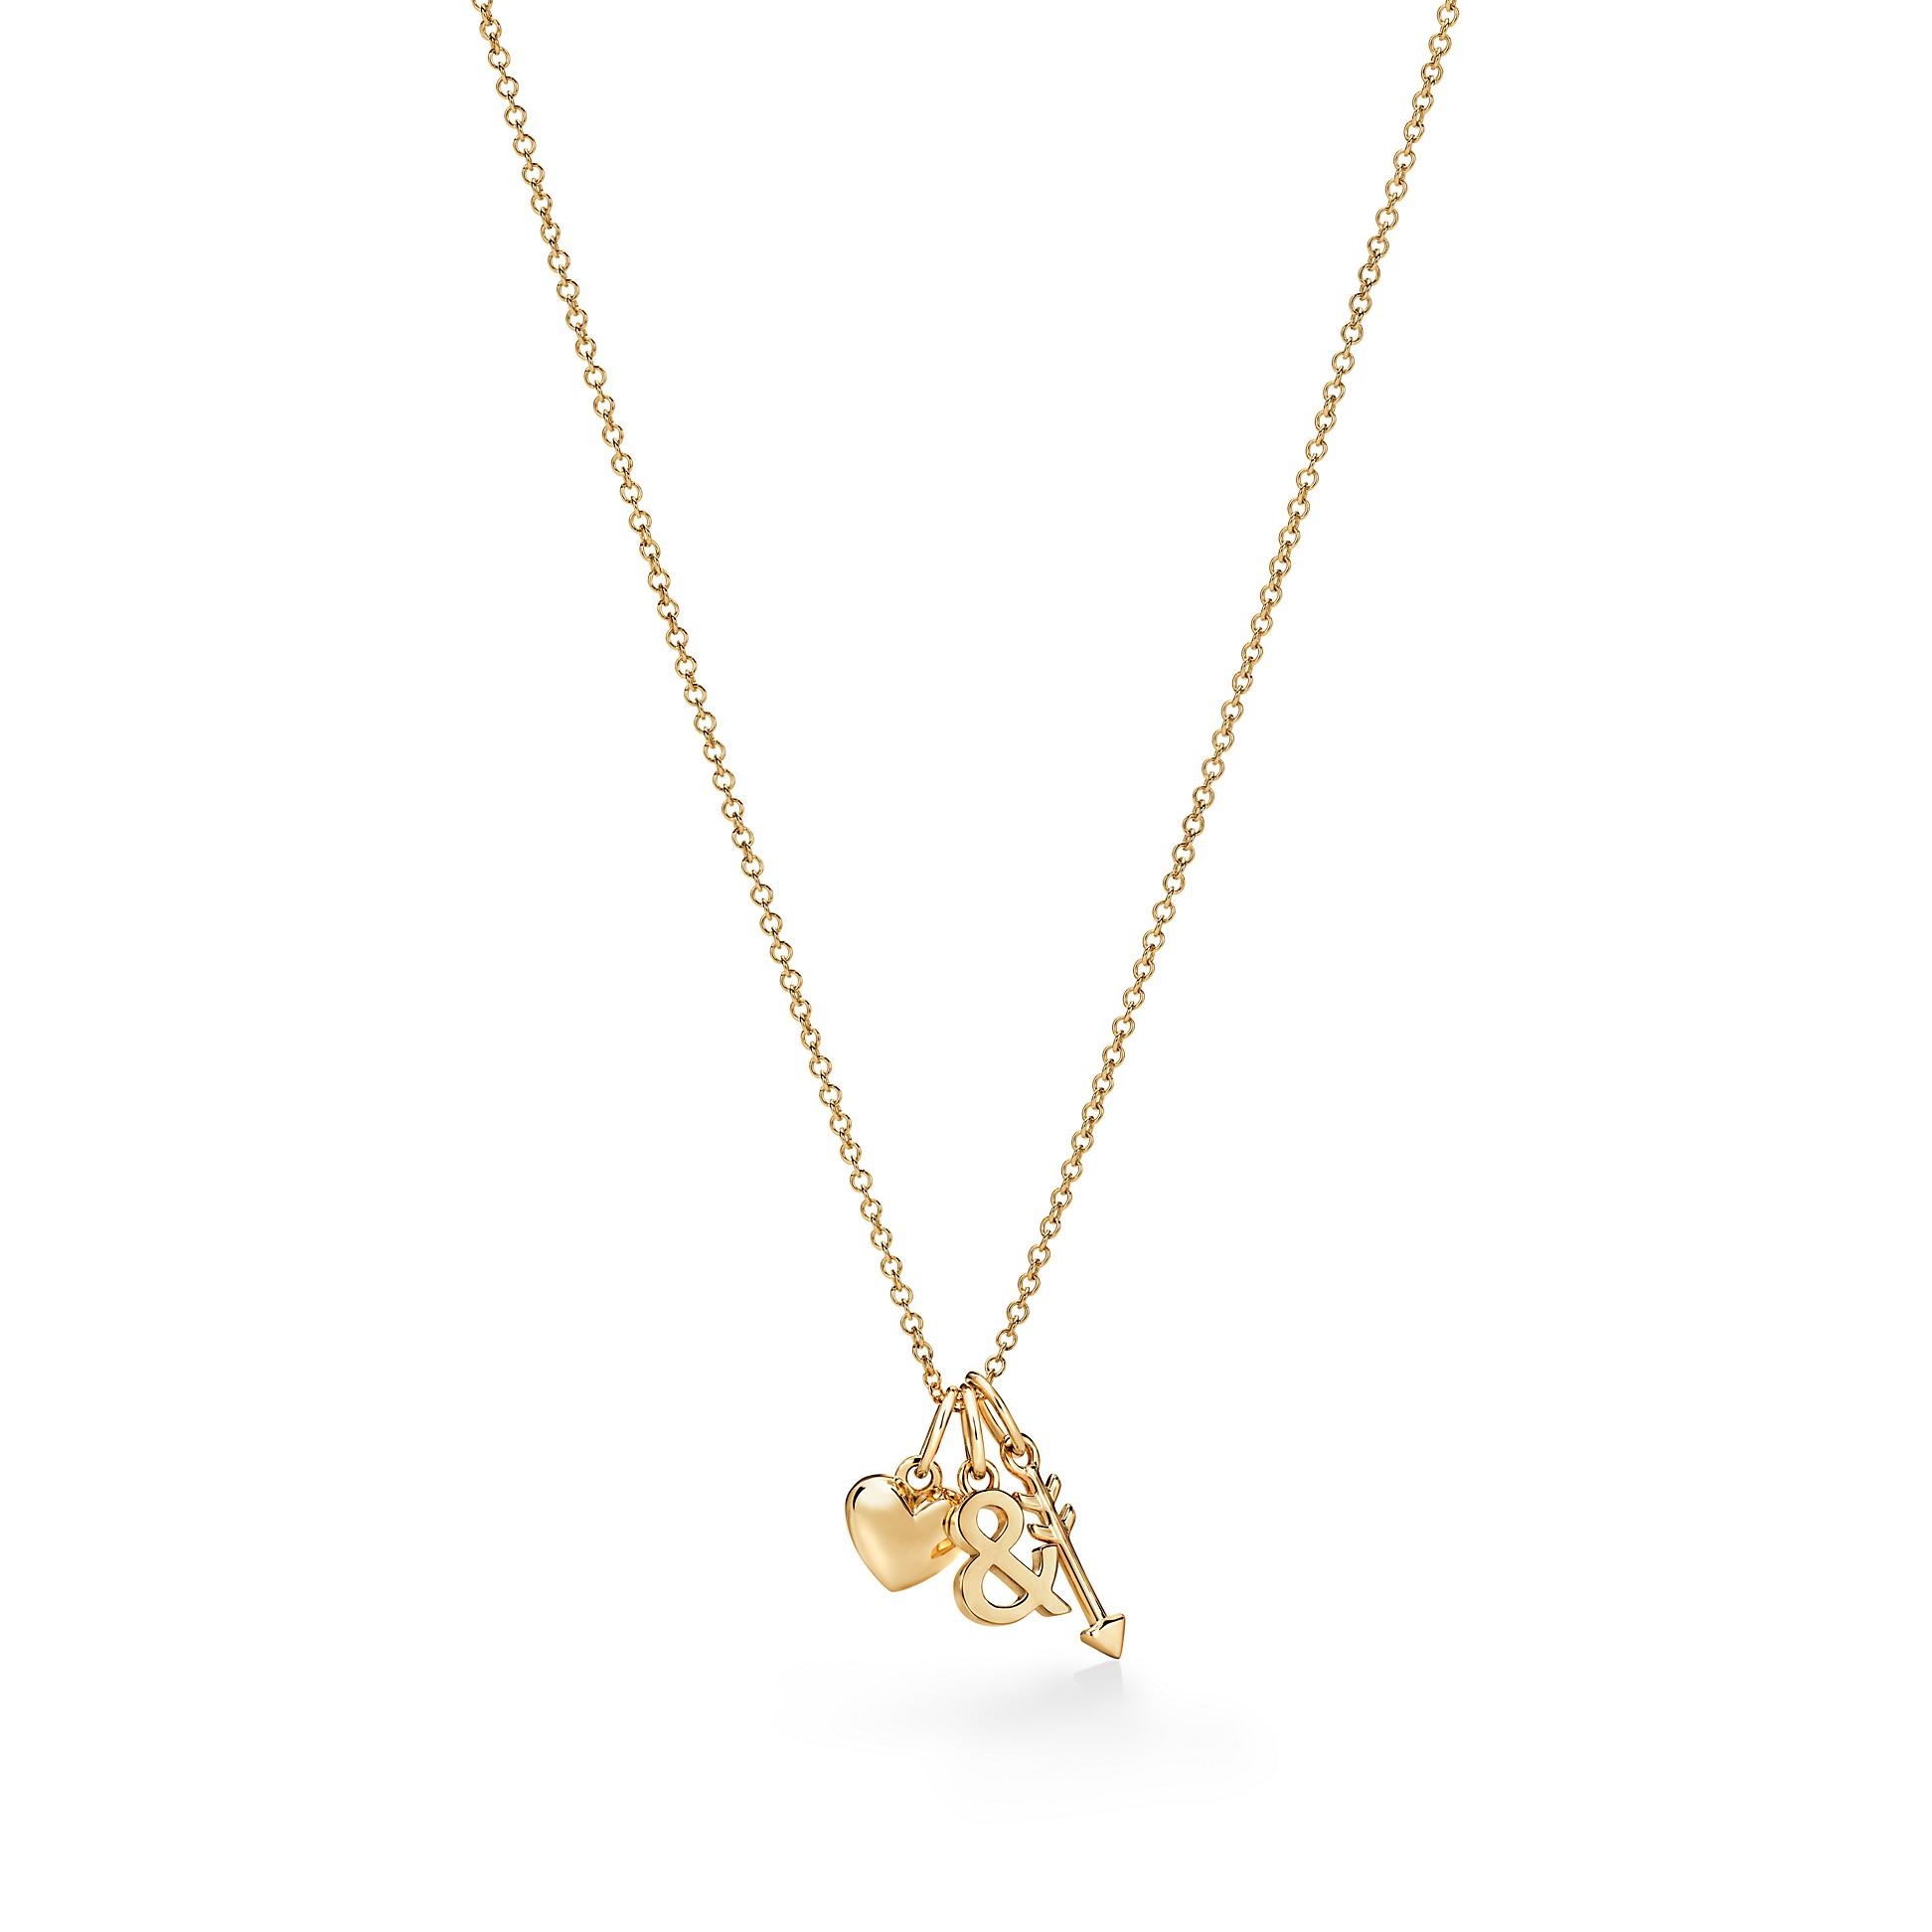 Tiffany & Love        Heart And Arrow Pendant In 18k Gold by Tiffany & Love